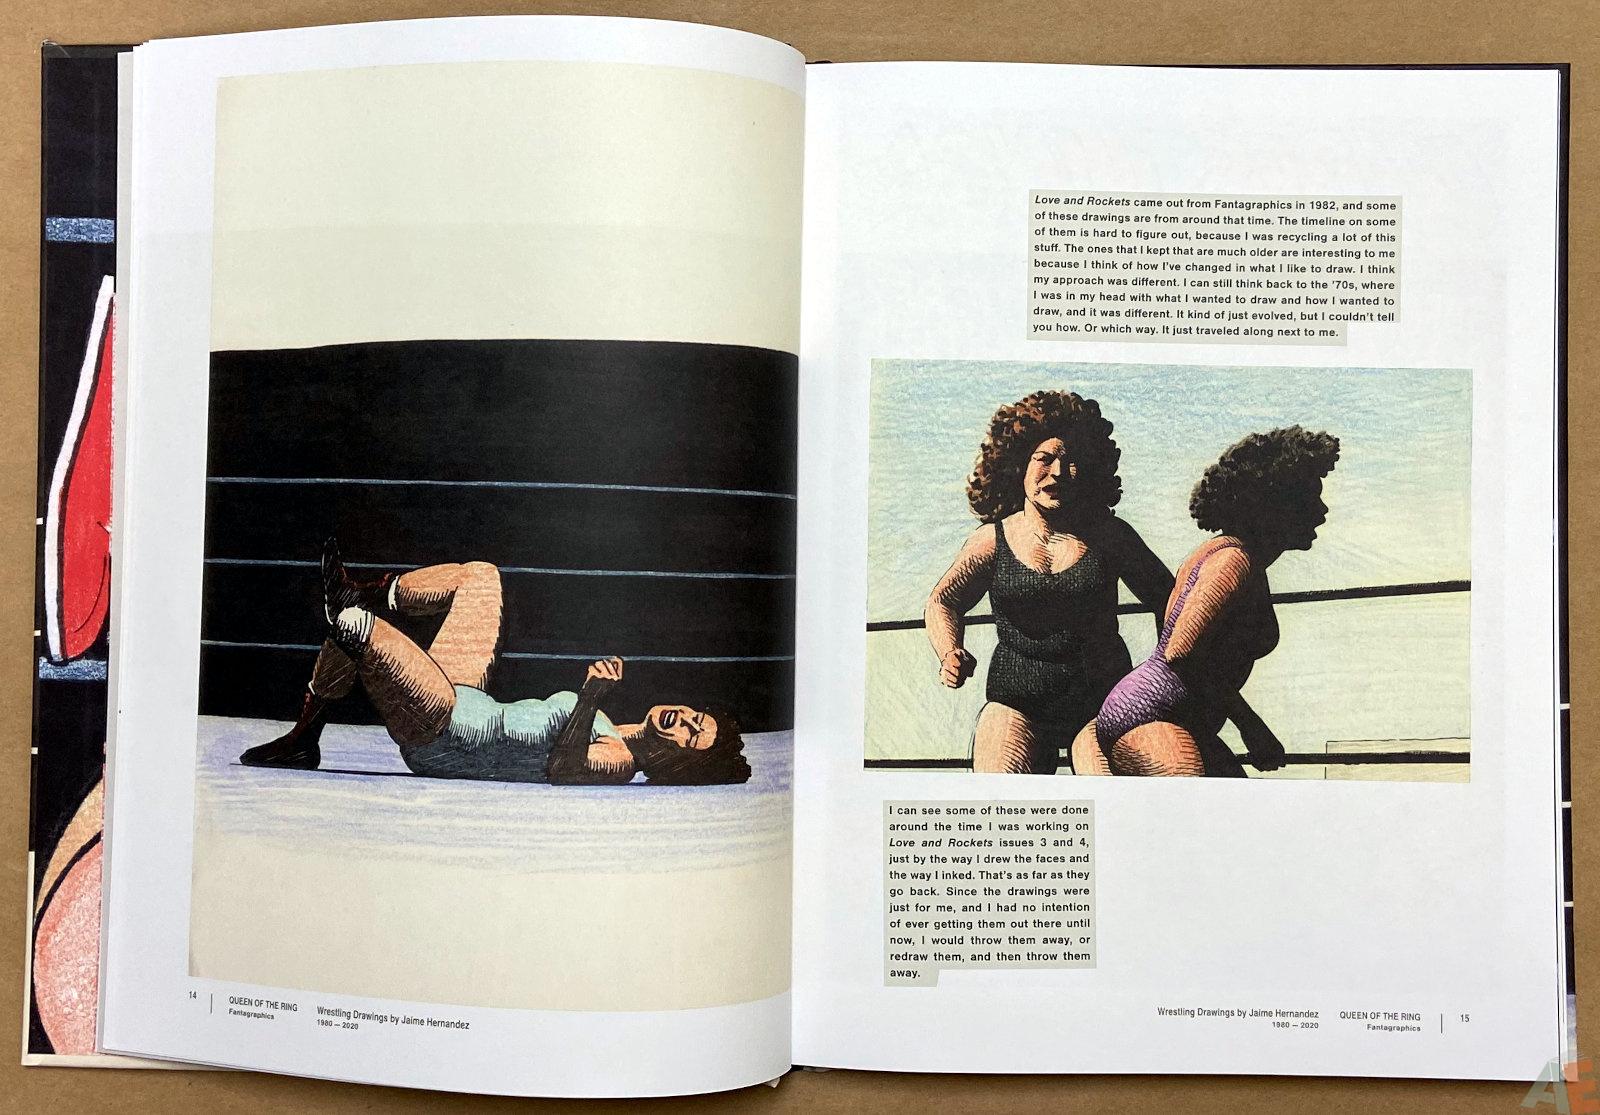 Queen of the Ring Wrestling Drawings by Jaime Hernandez 1980 2020 interior 3